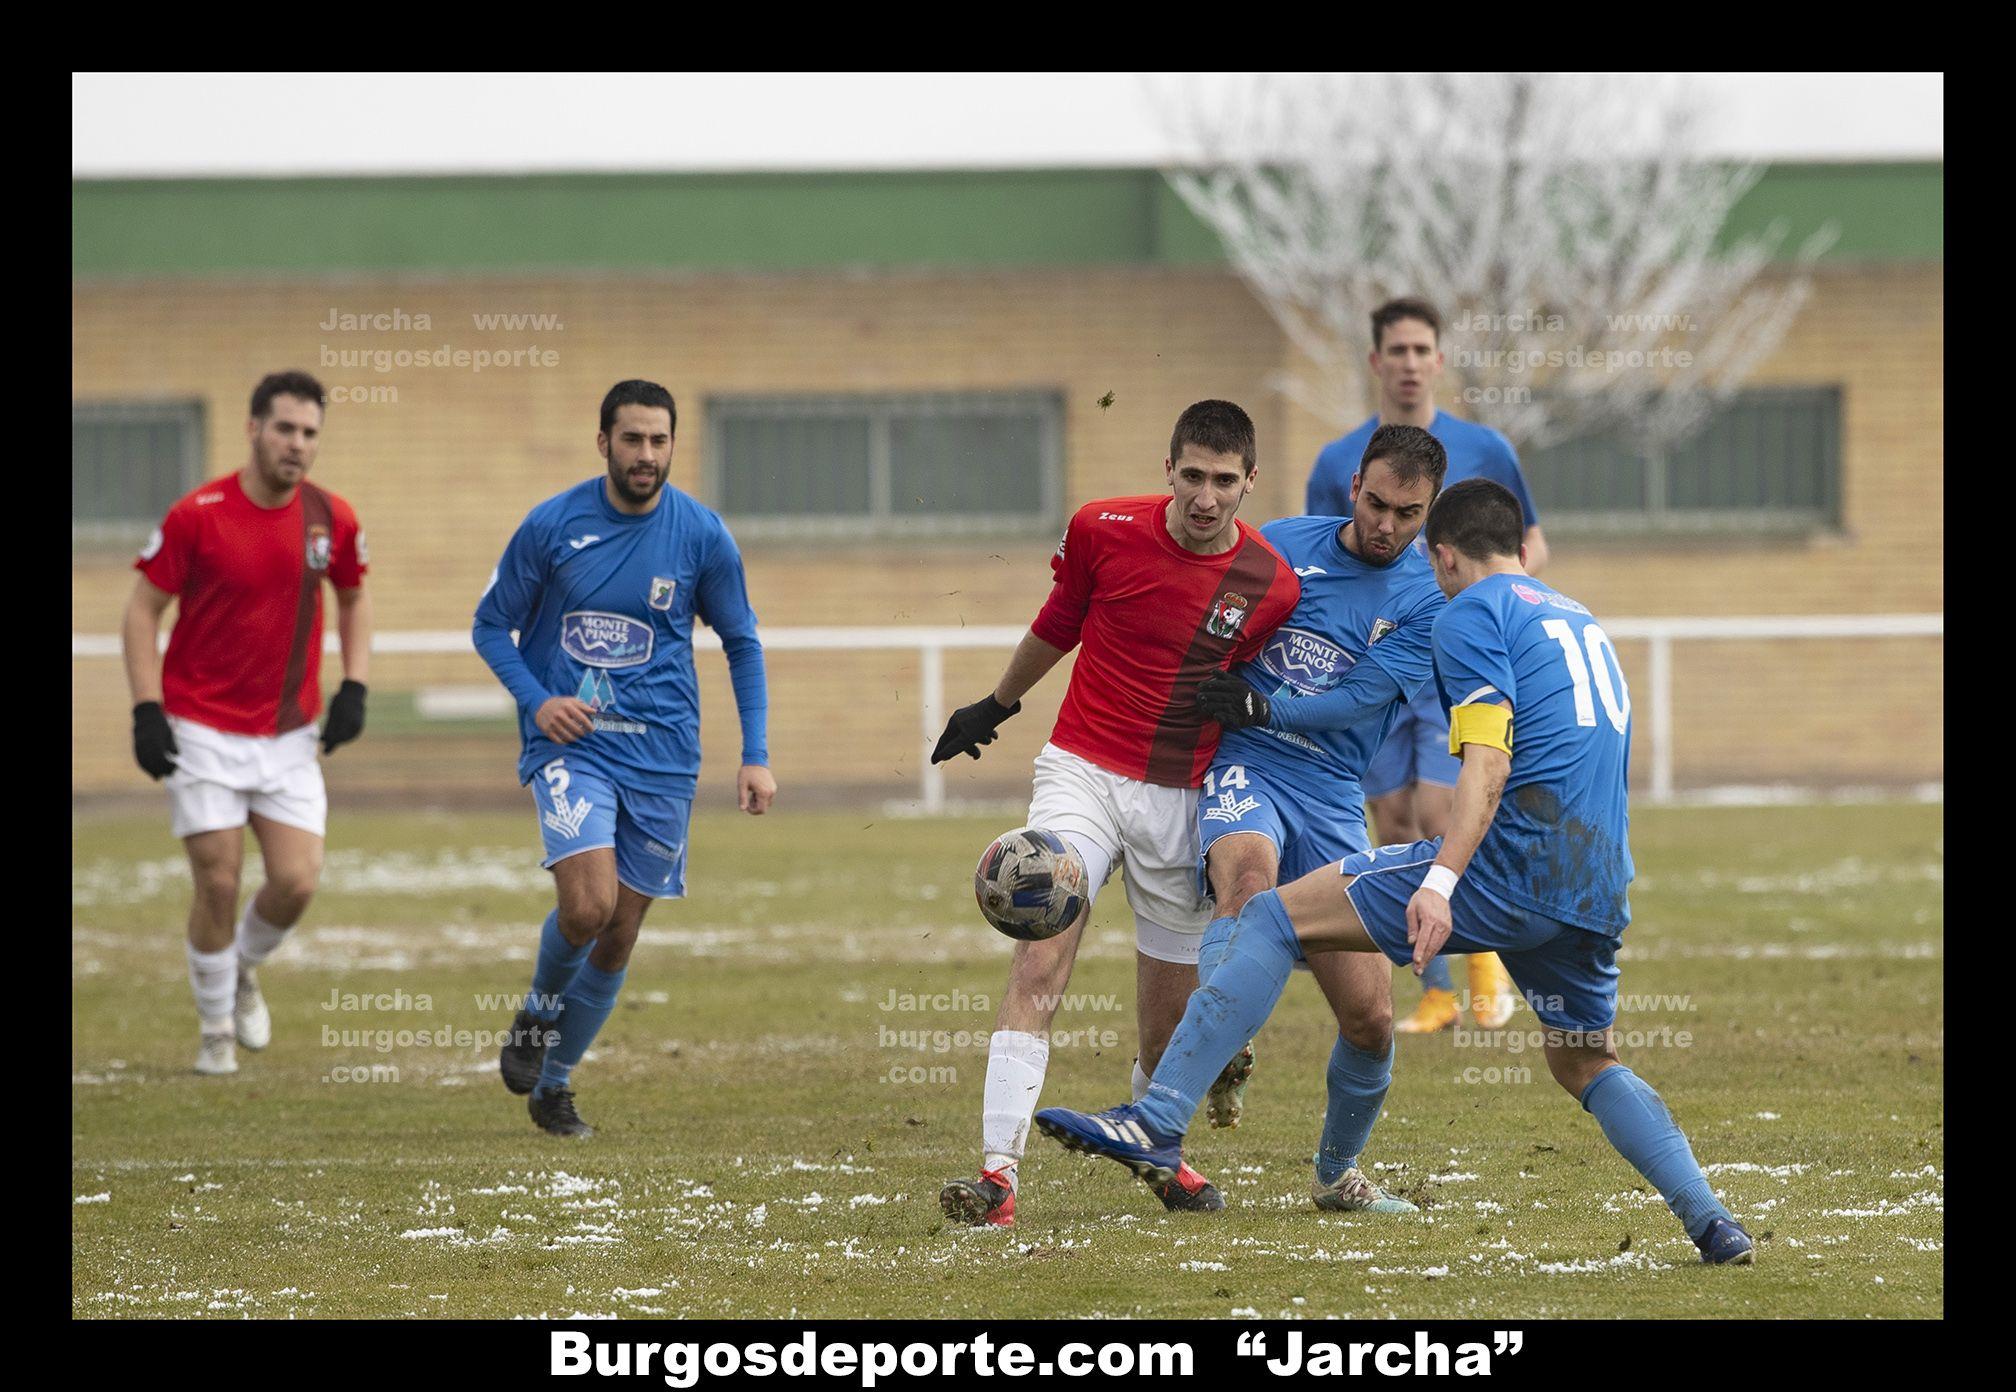 RELA BURGOS SAD 0 - SD ALMAZAN 0